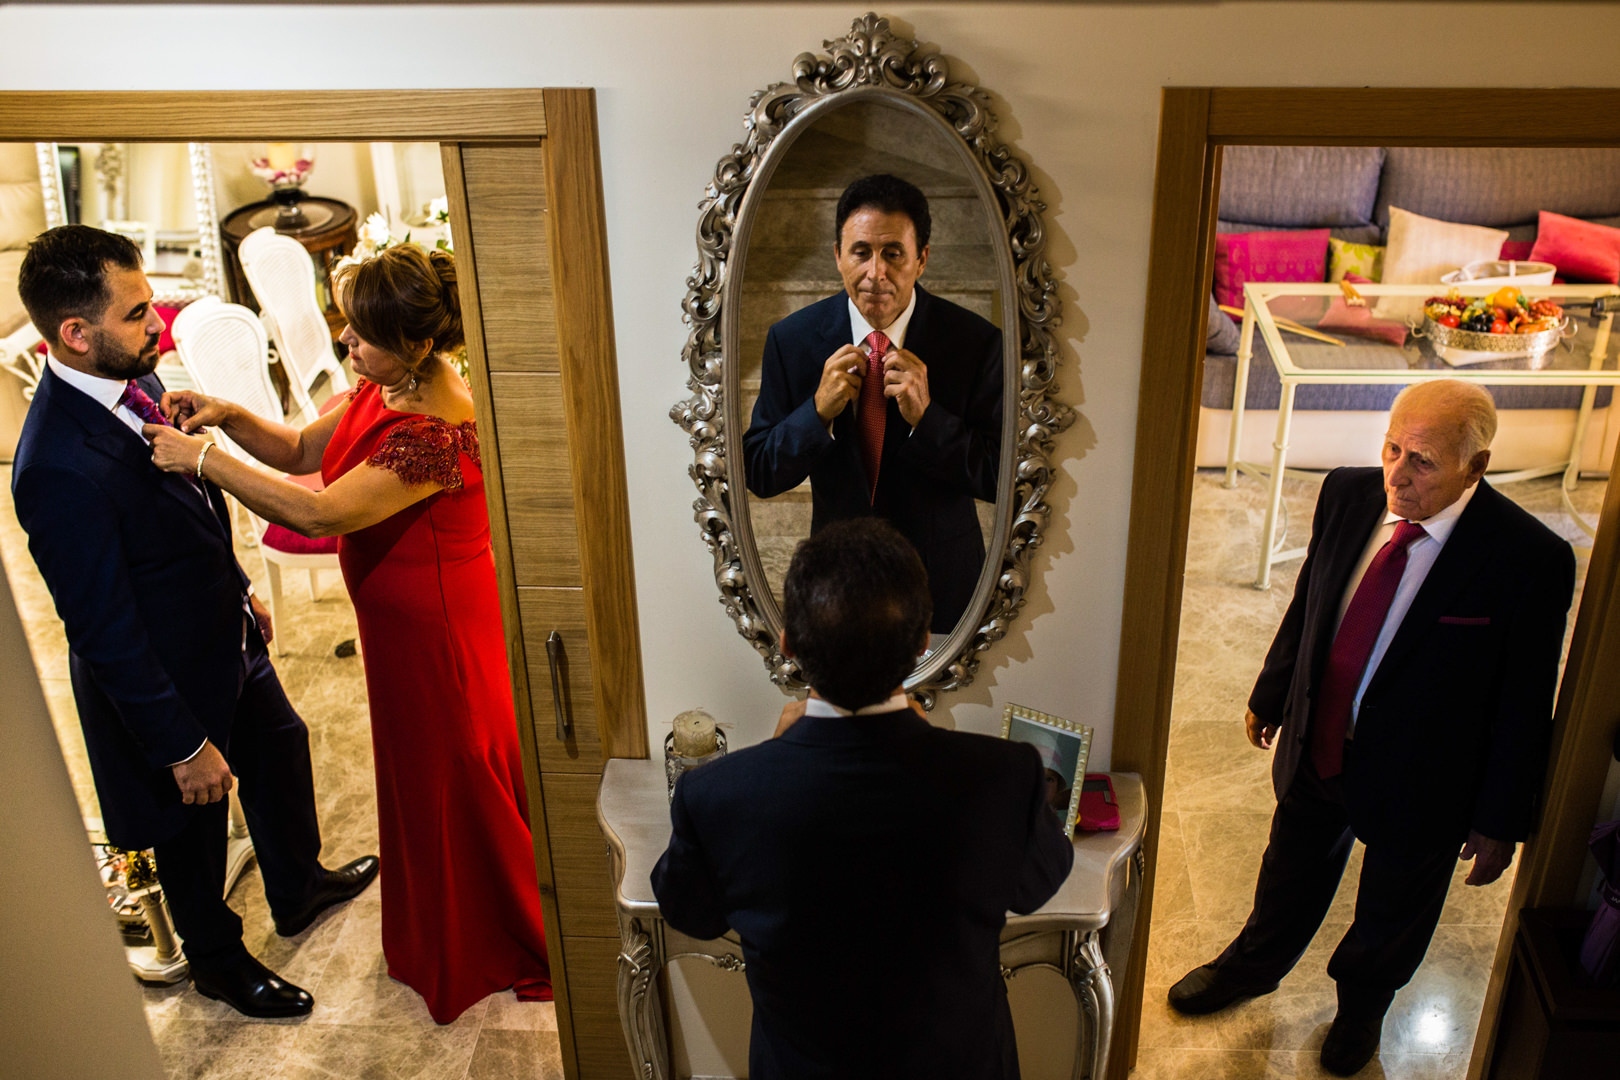 Boda-Irene-Marcos-Dos-Hermanas-Finca-Clotidle-engagement-Rafael-Torres-fotografo-bodas-sevilla-madrid-barcelona-wedding-photographer--8.jpg